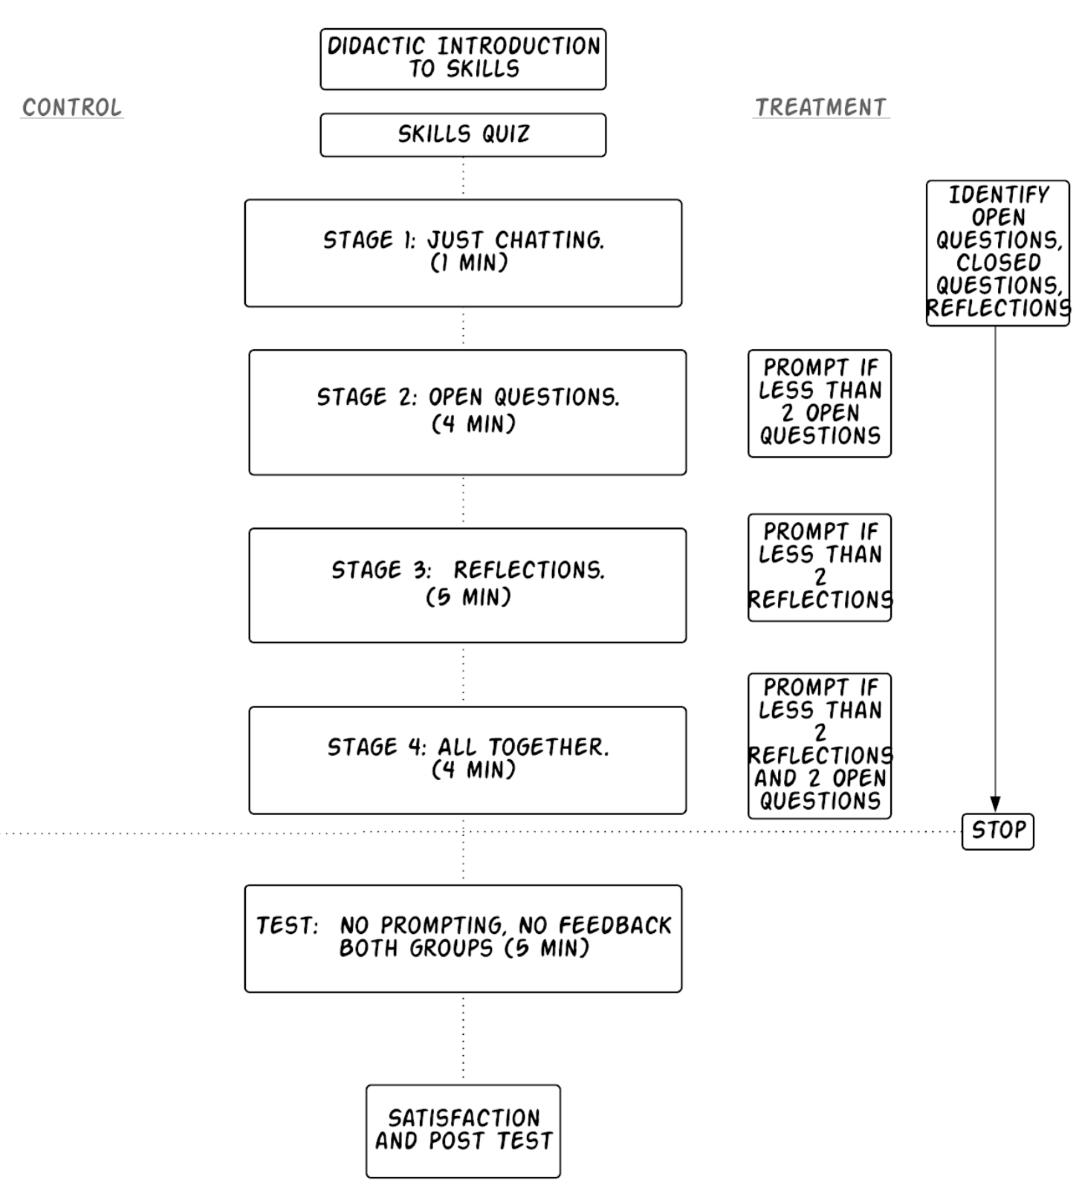 JMIR - Development and Evaluation of ClientBot: Patient-Like